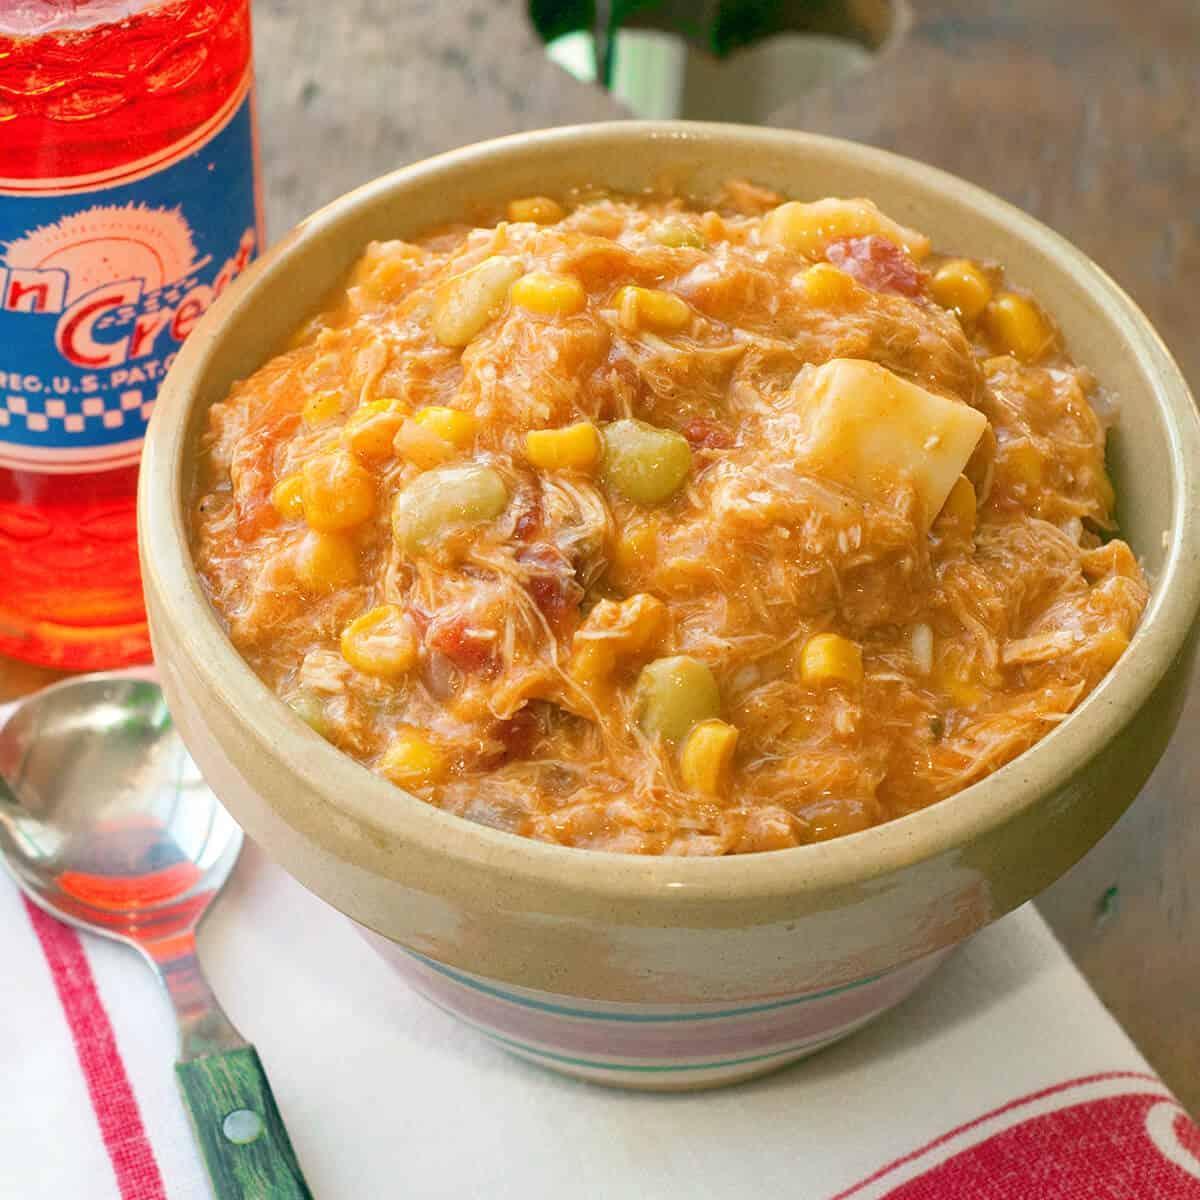 Brunswick stew in a vintage bowl.